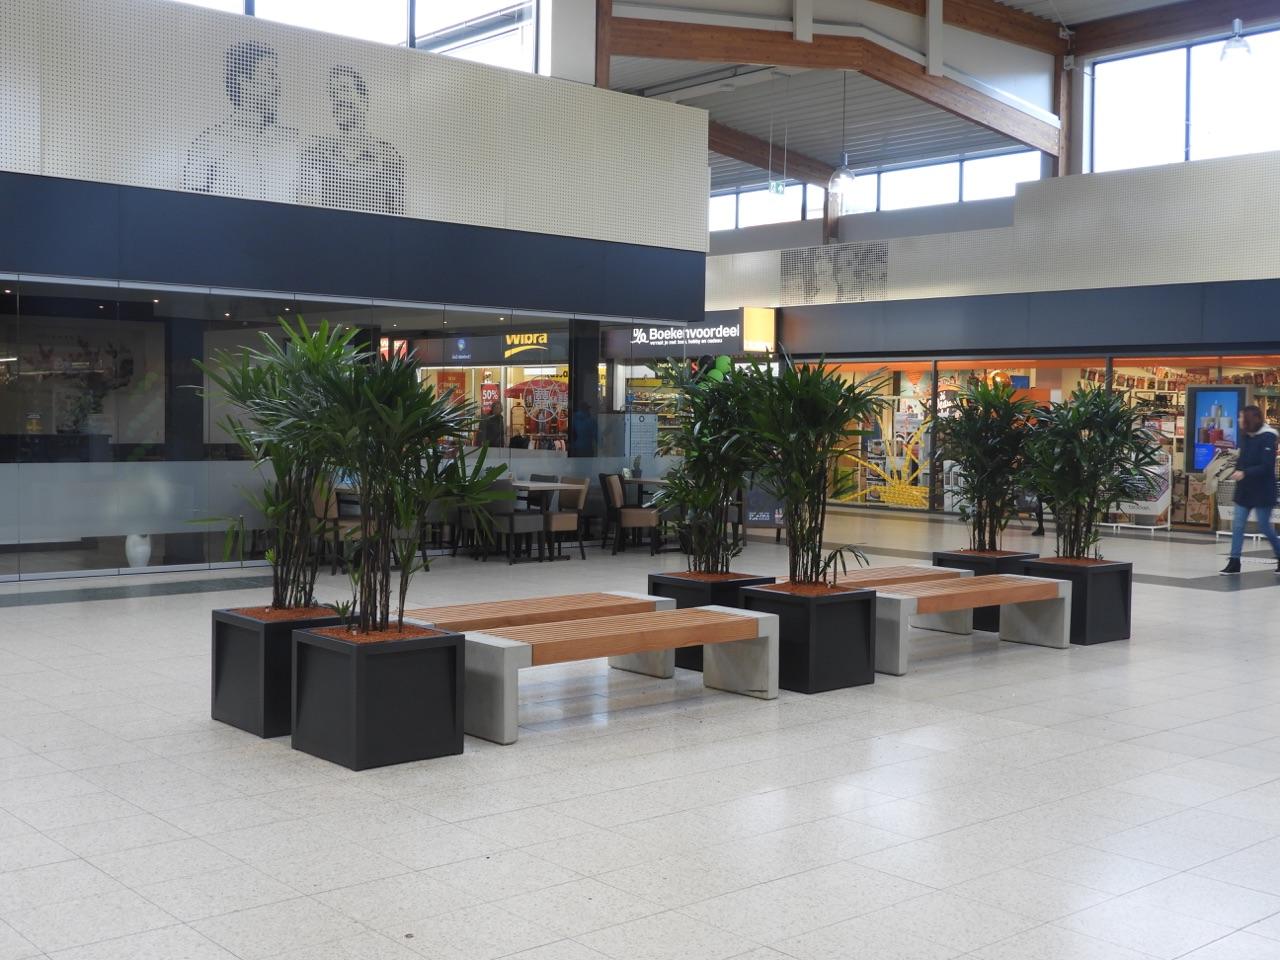 Frame plantenbak stijlvolle en robuuste plantenbak